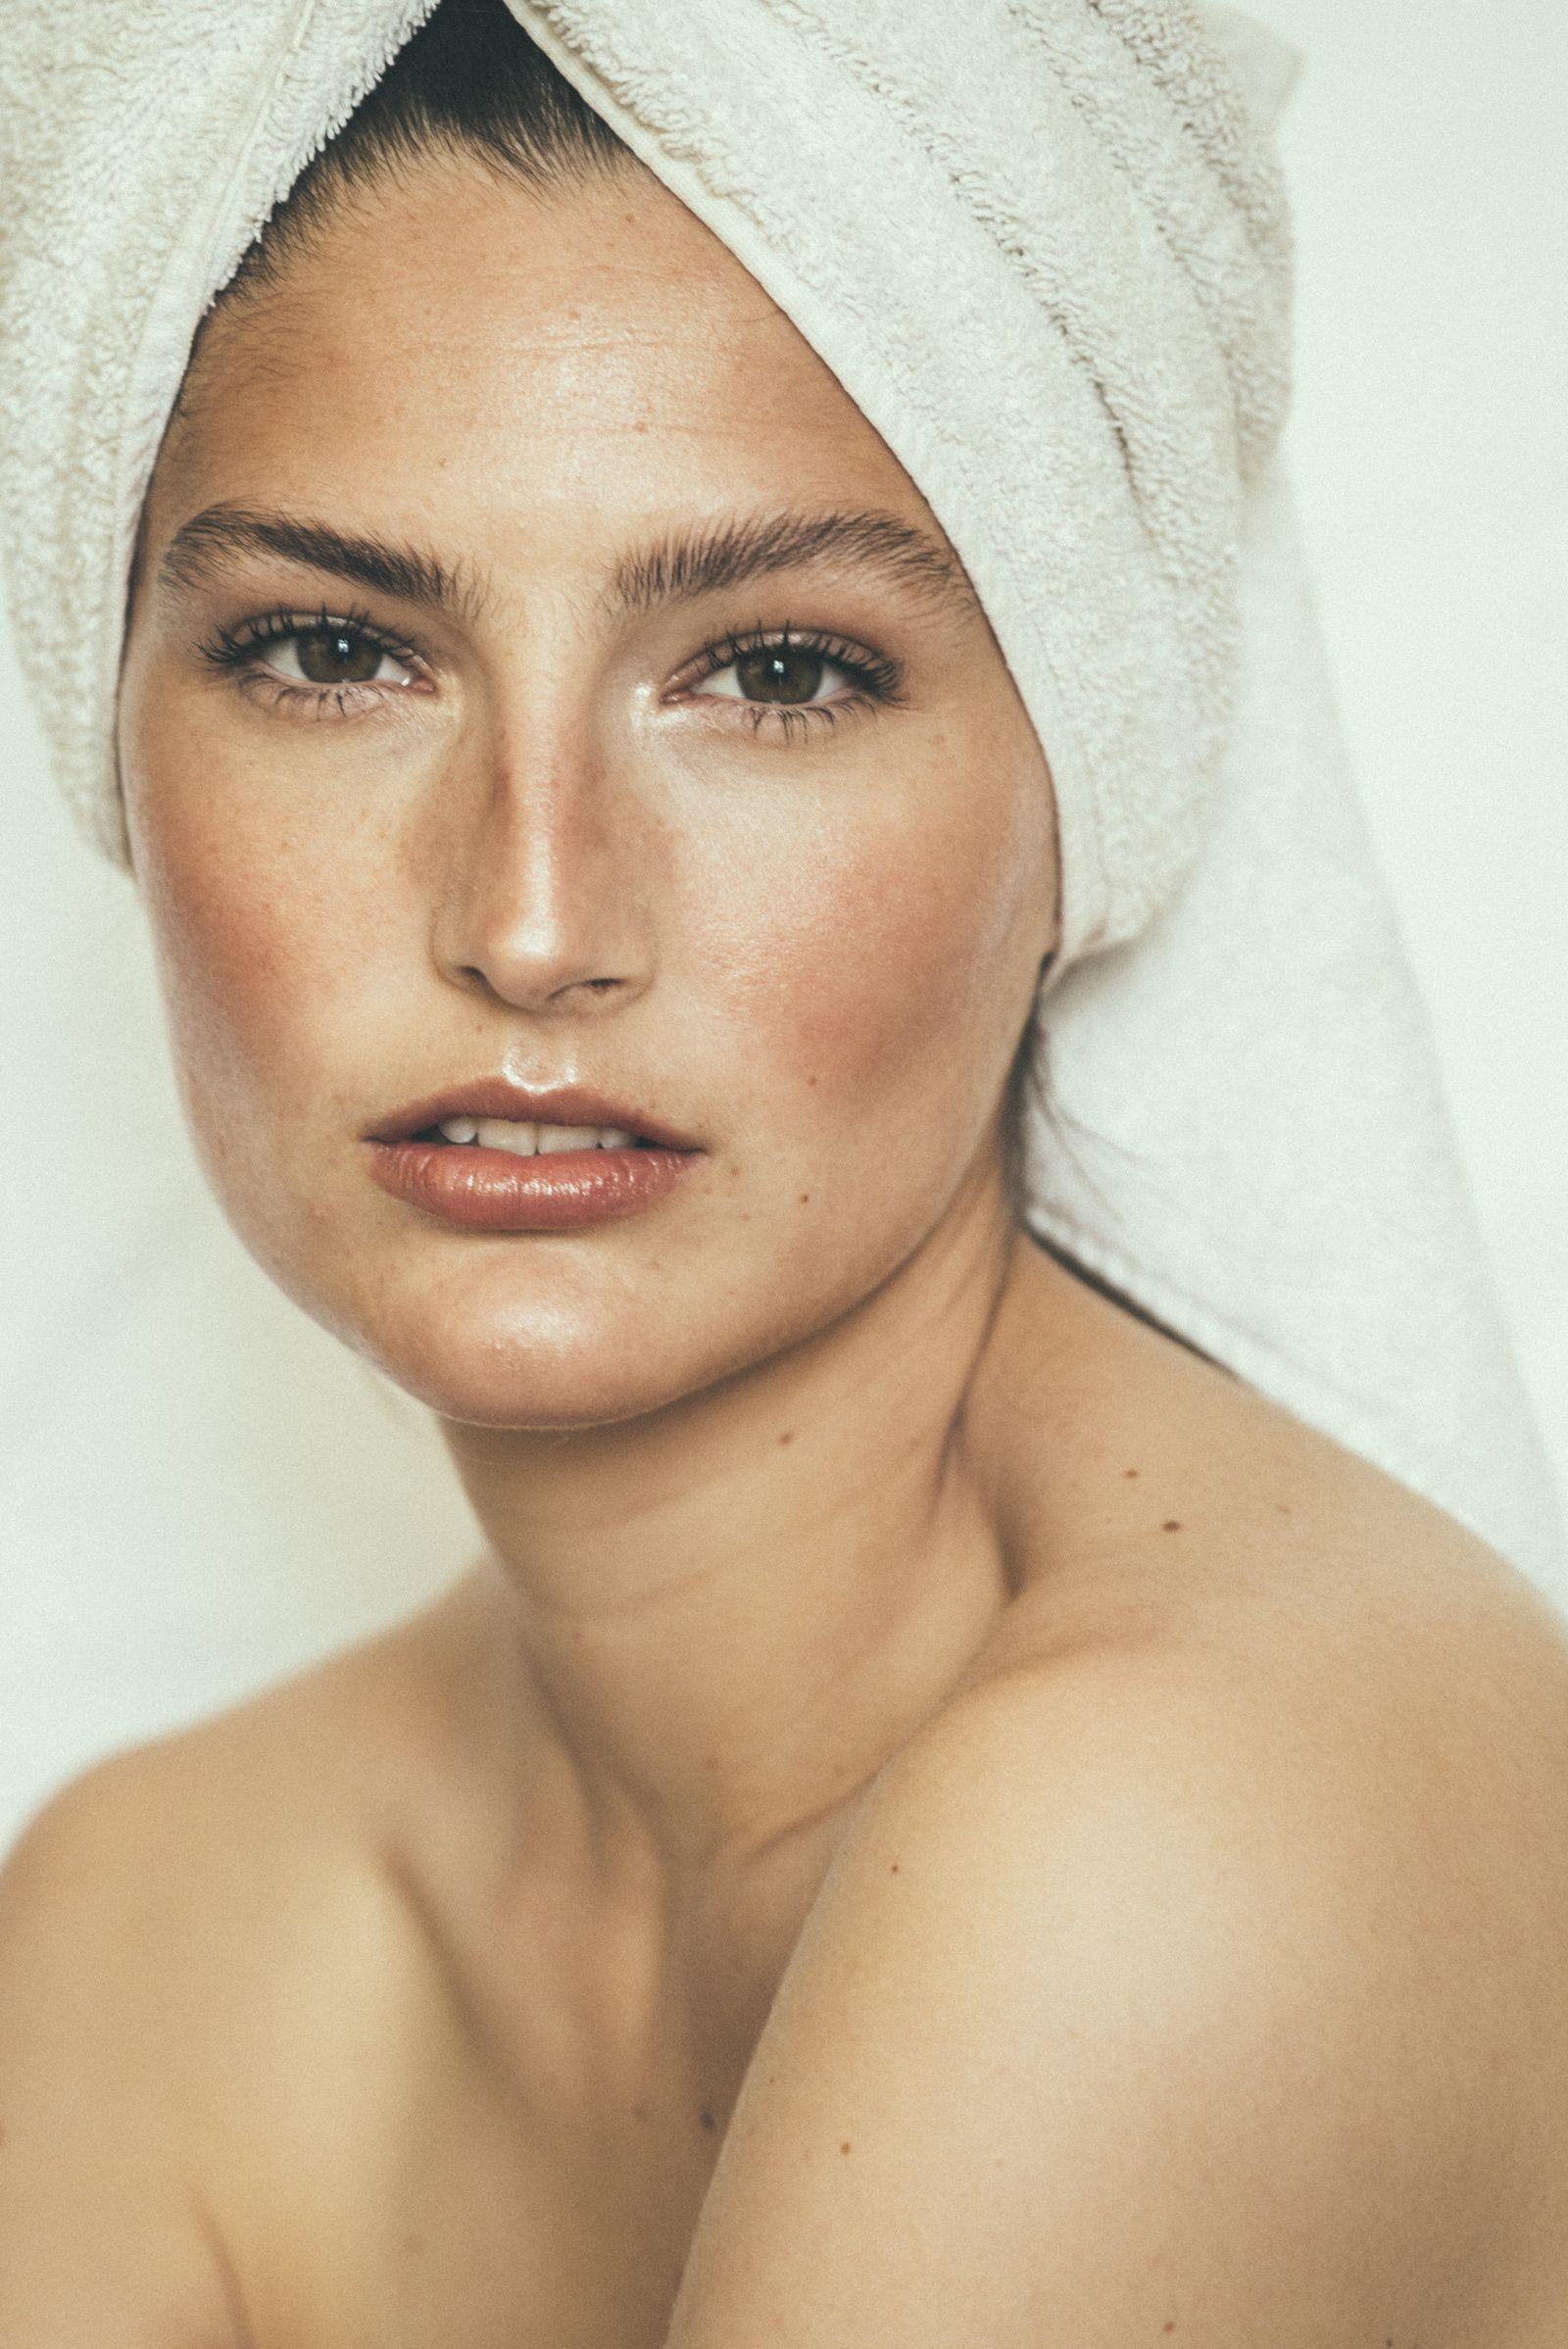 Carmen Claire Plekhoff / Makeup artist based in Paris